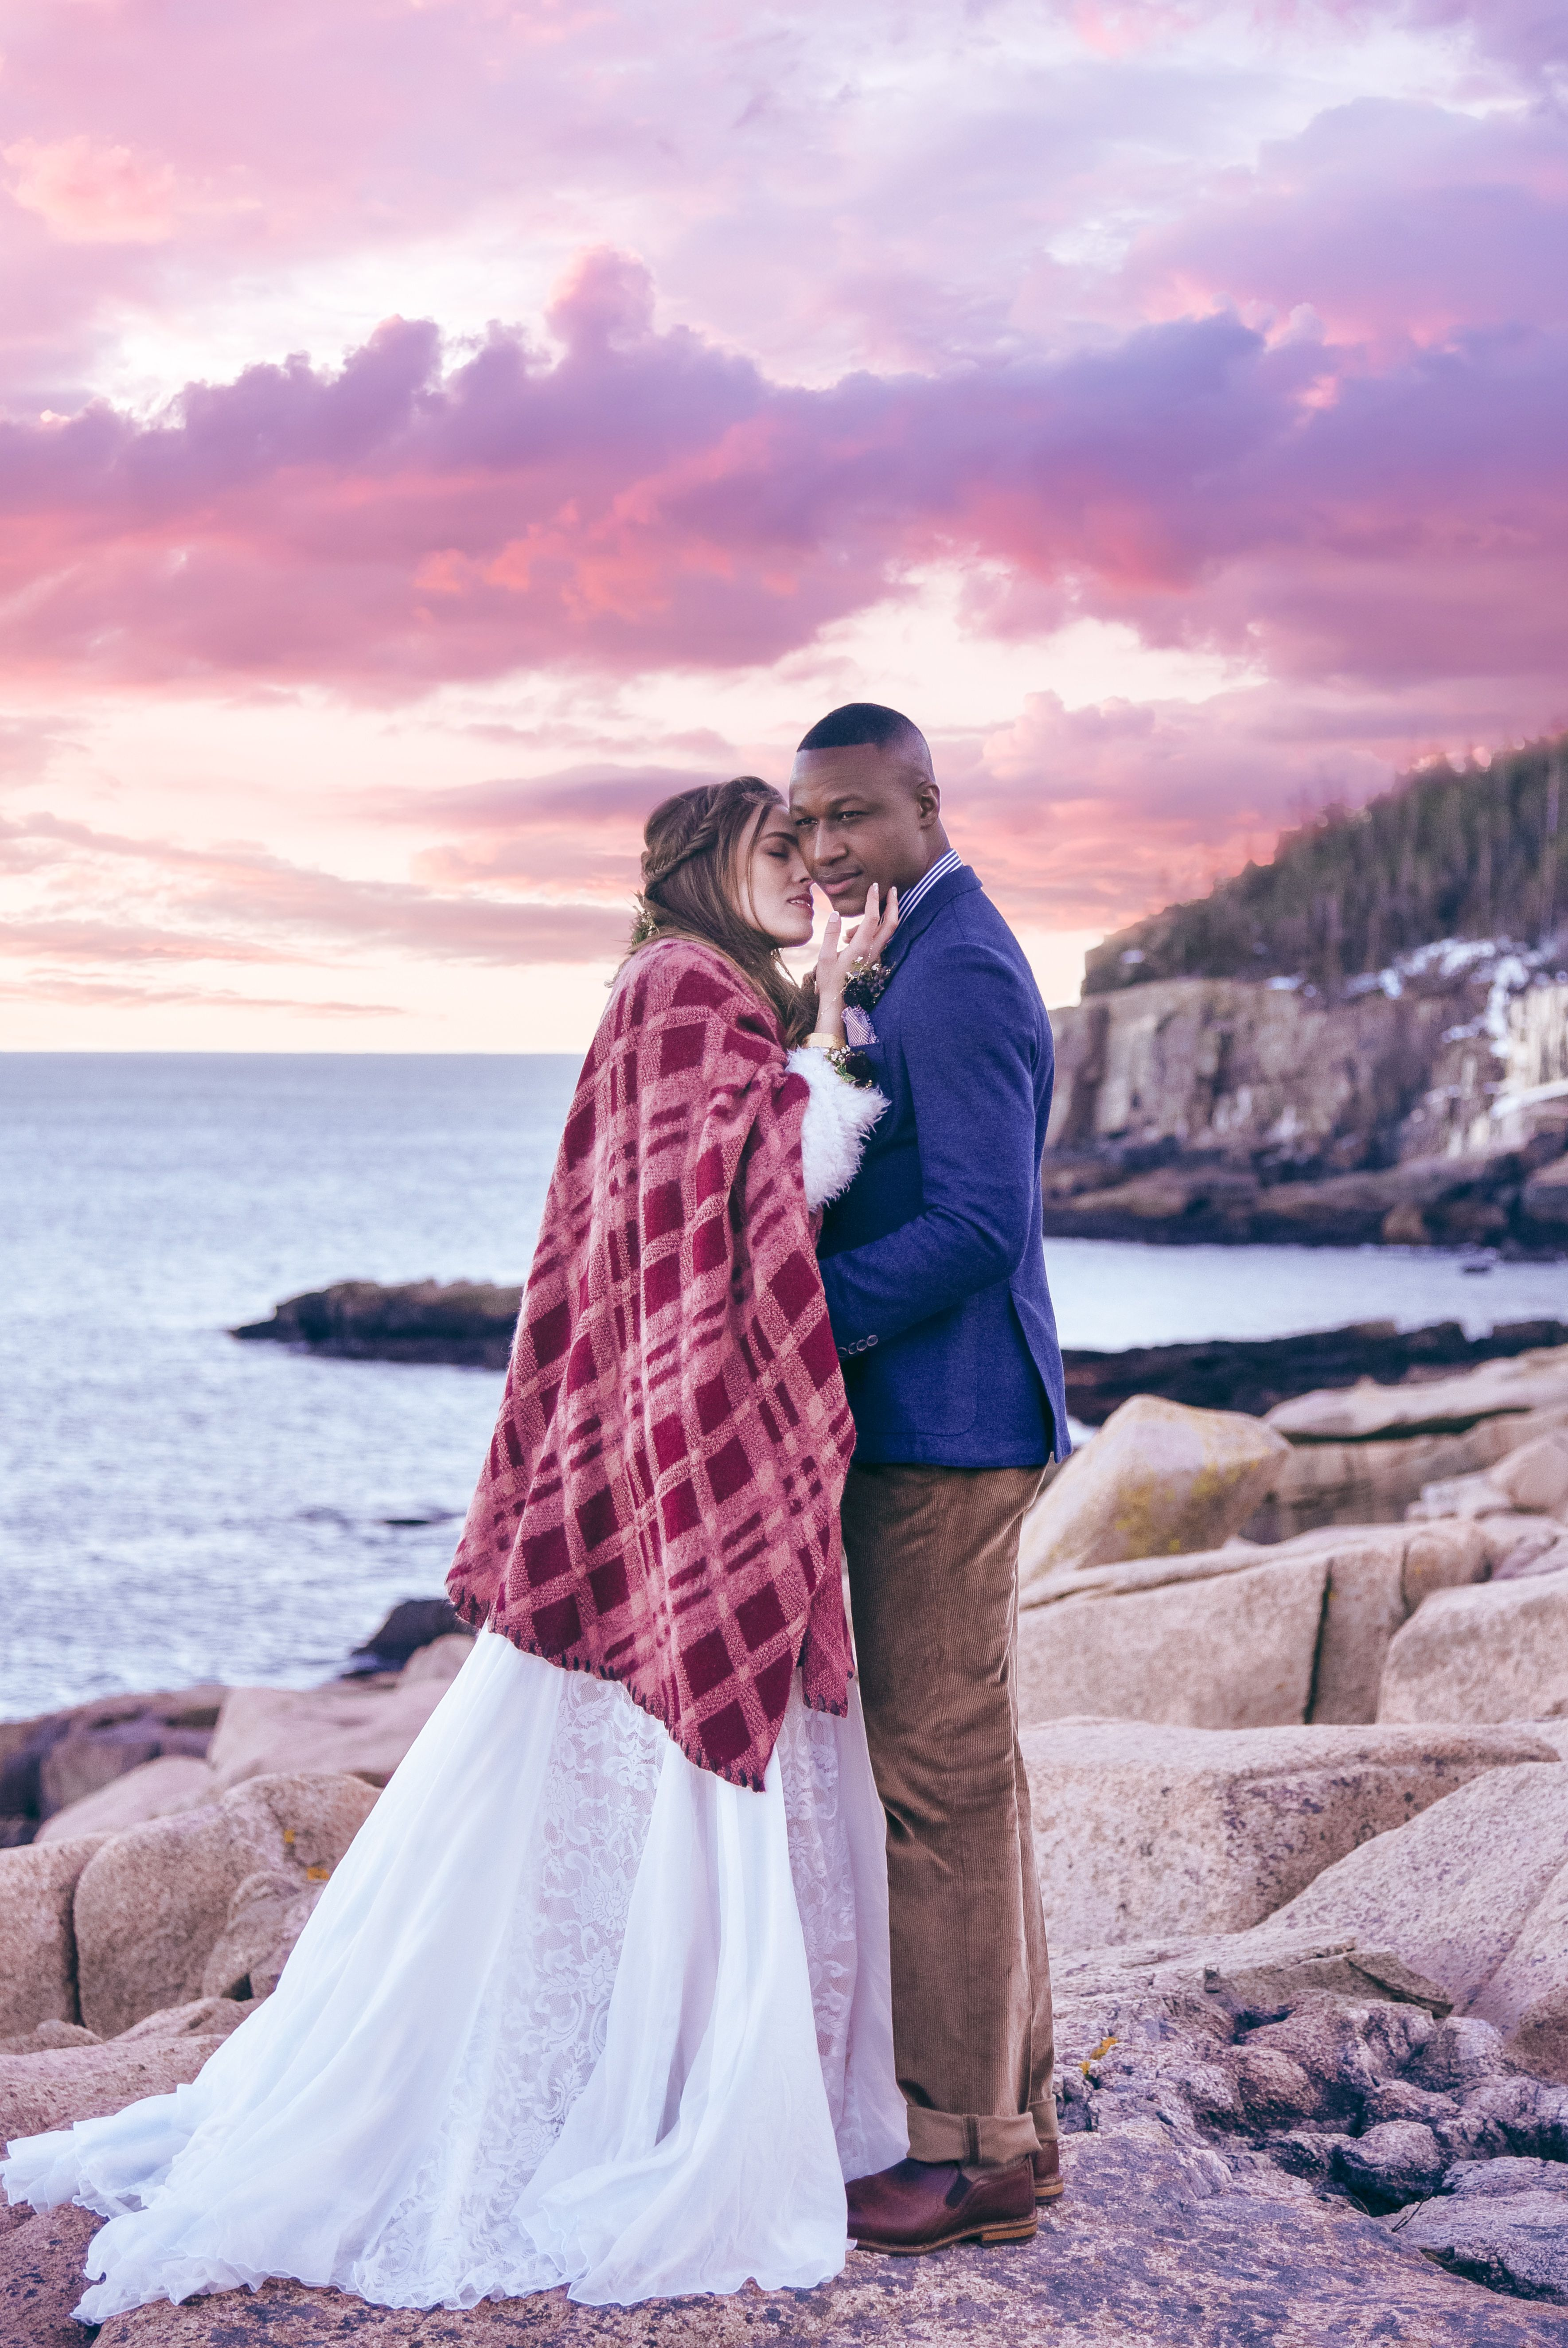 Bohemian Adventure Elopement In Acadia National Park Maine Vintage Wedding Grooms Style Bride Winter